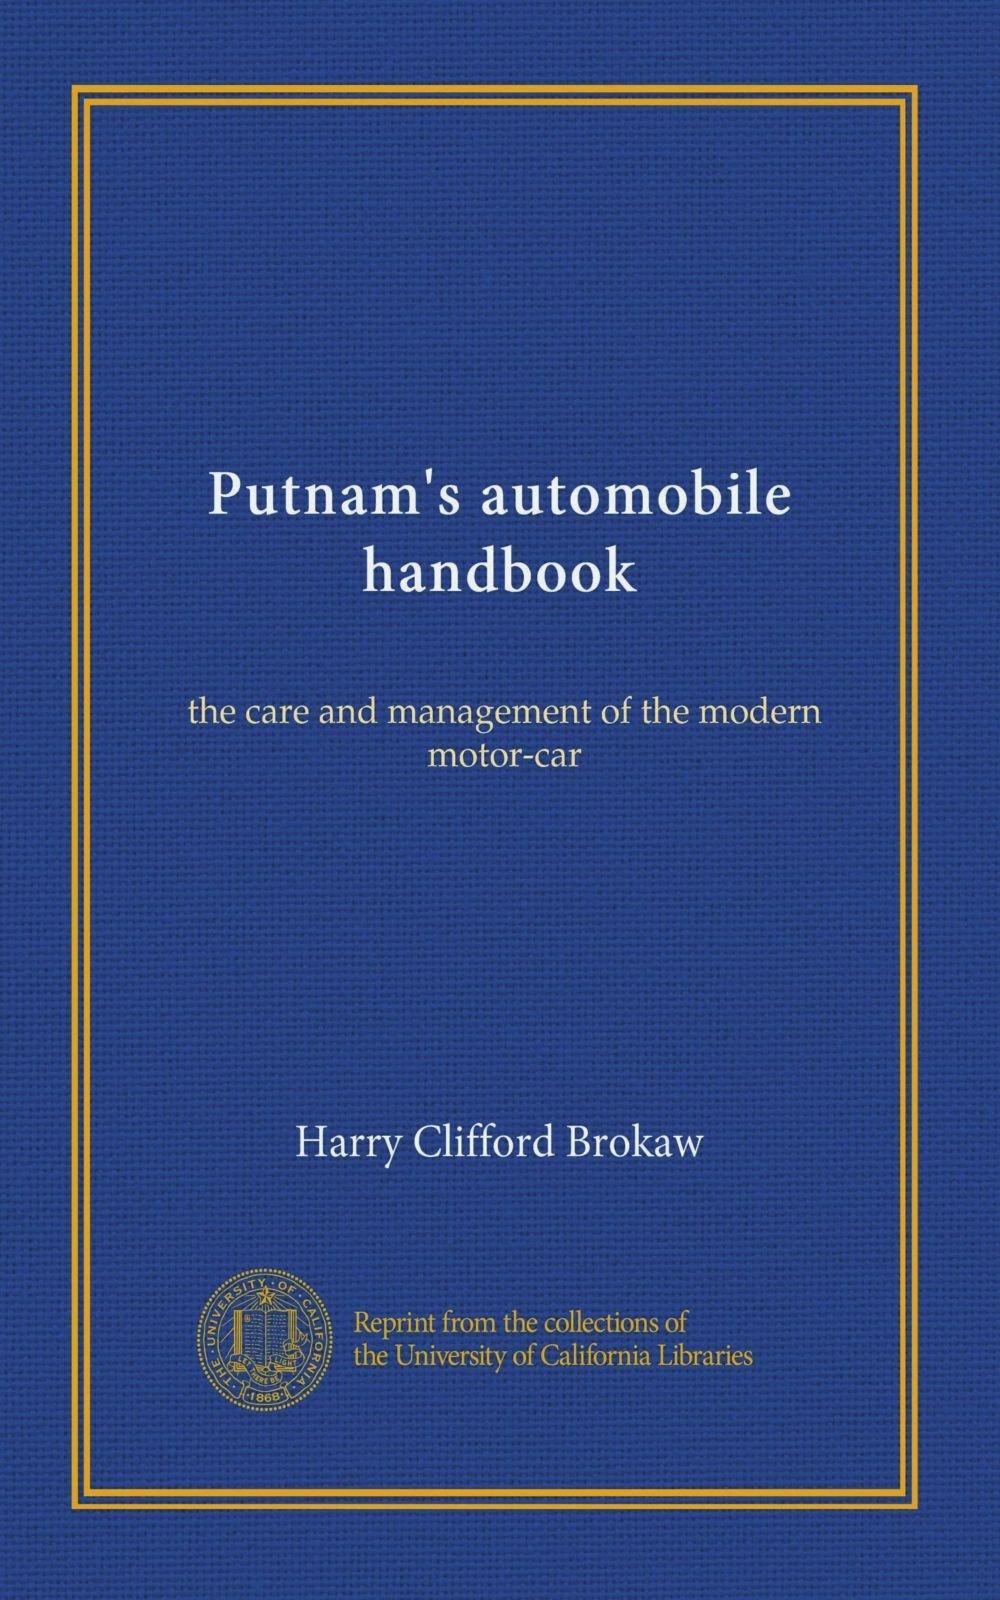 Putnam's automobile handbook: the care and management of the modern motor-car pdf epub